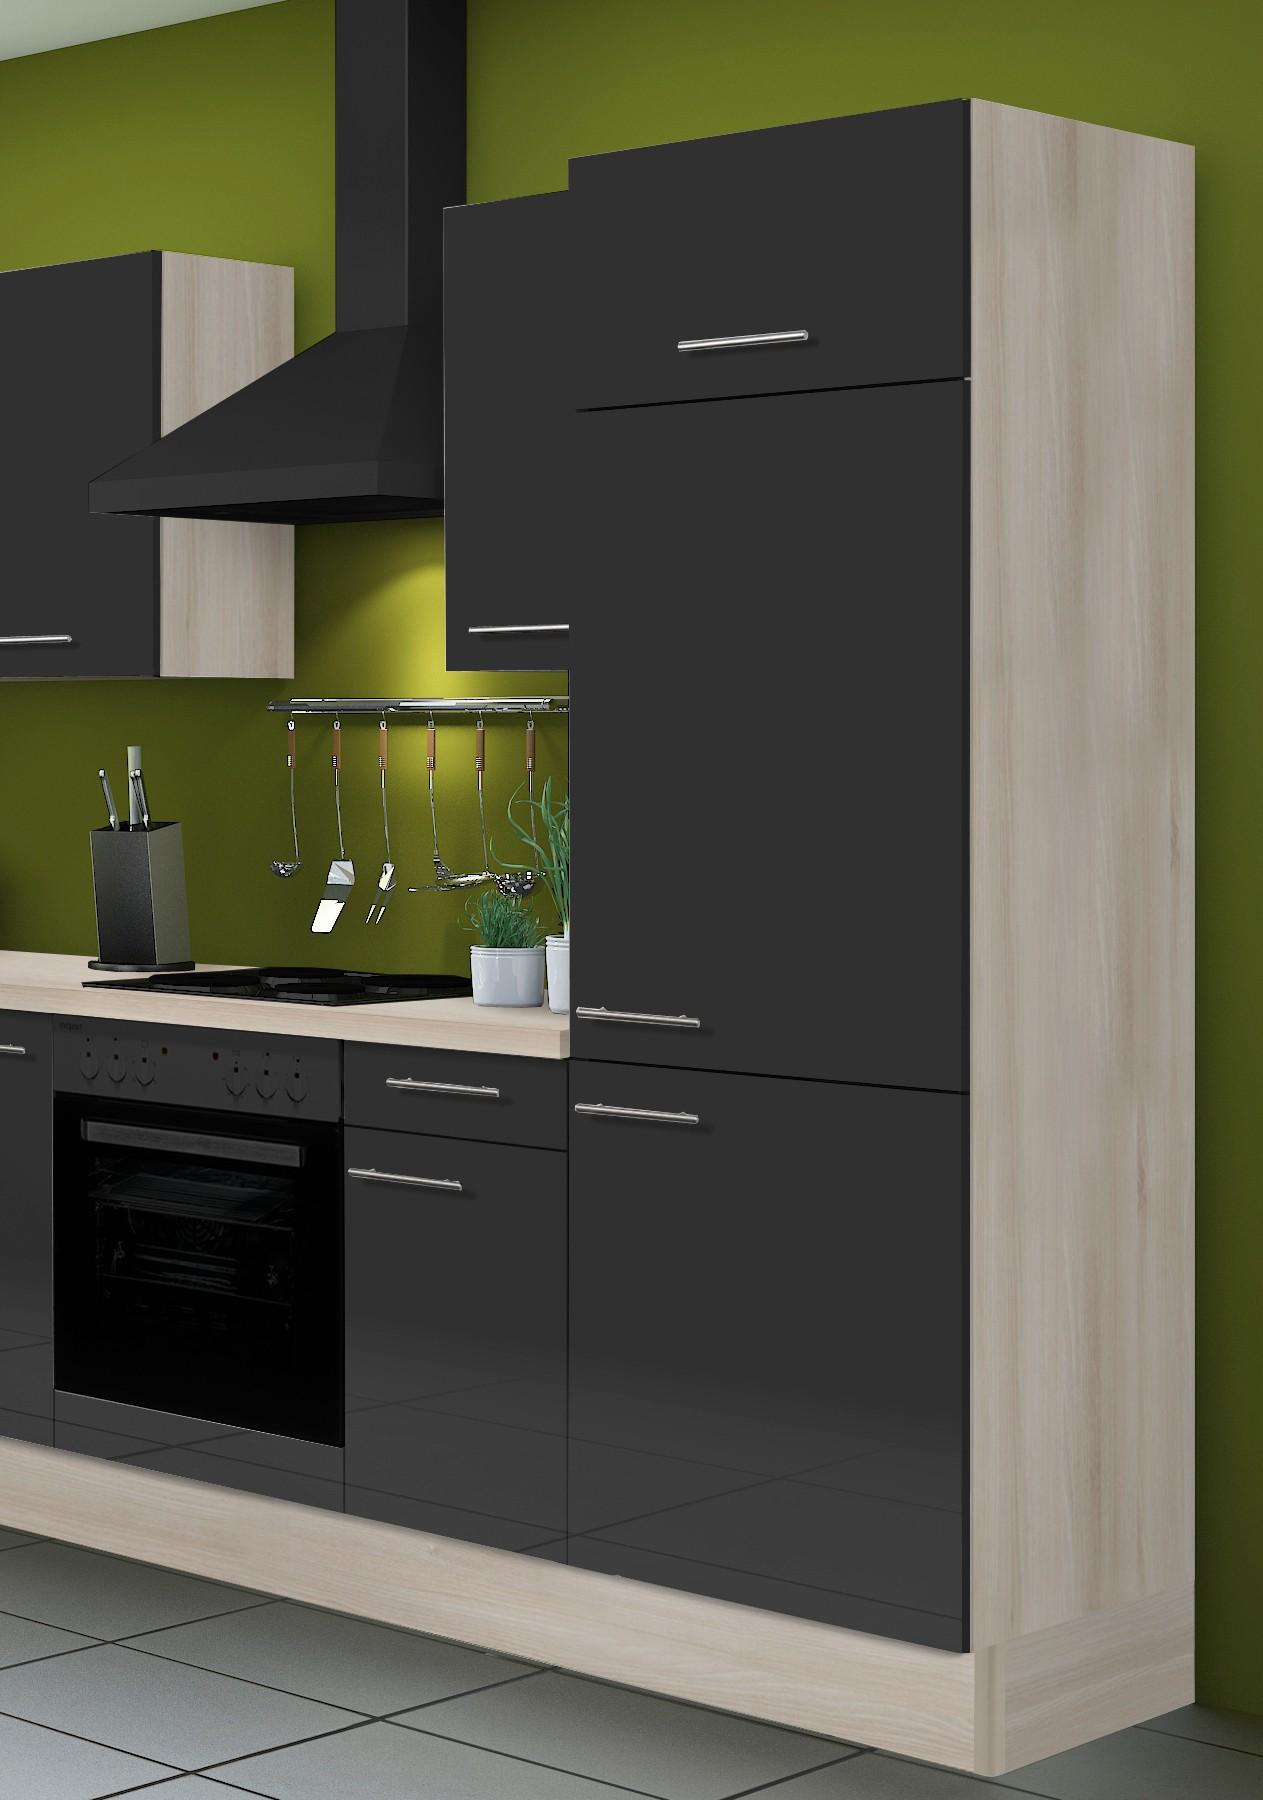 Eckküche LEON - Vario 2 - L-Küche ohne E-Geräte - Breite 270 x 175 ...